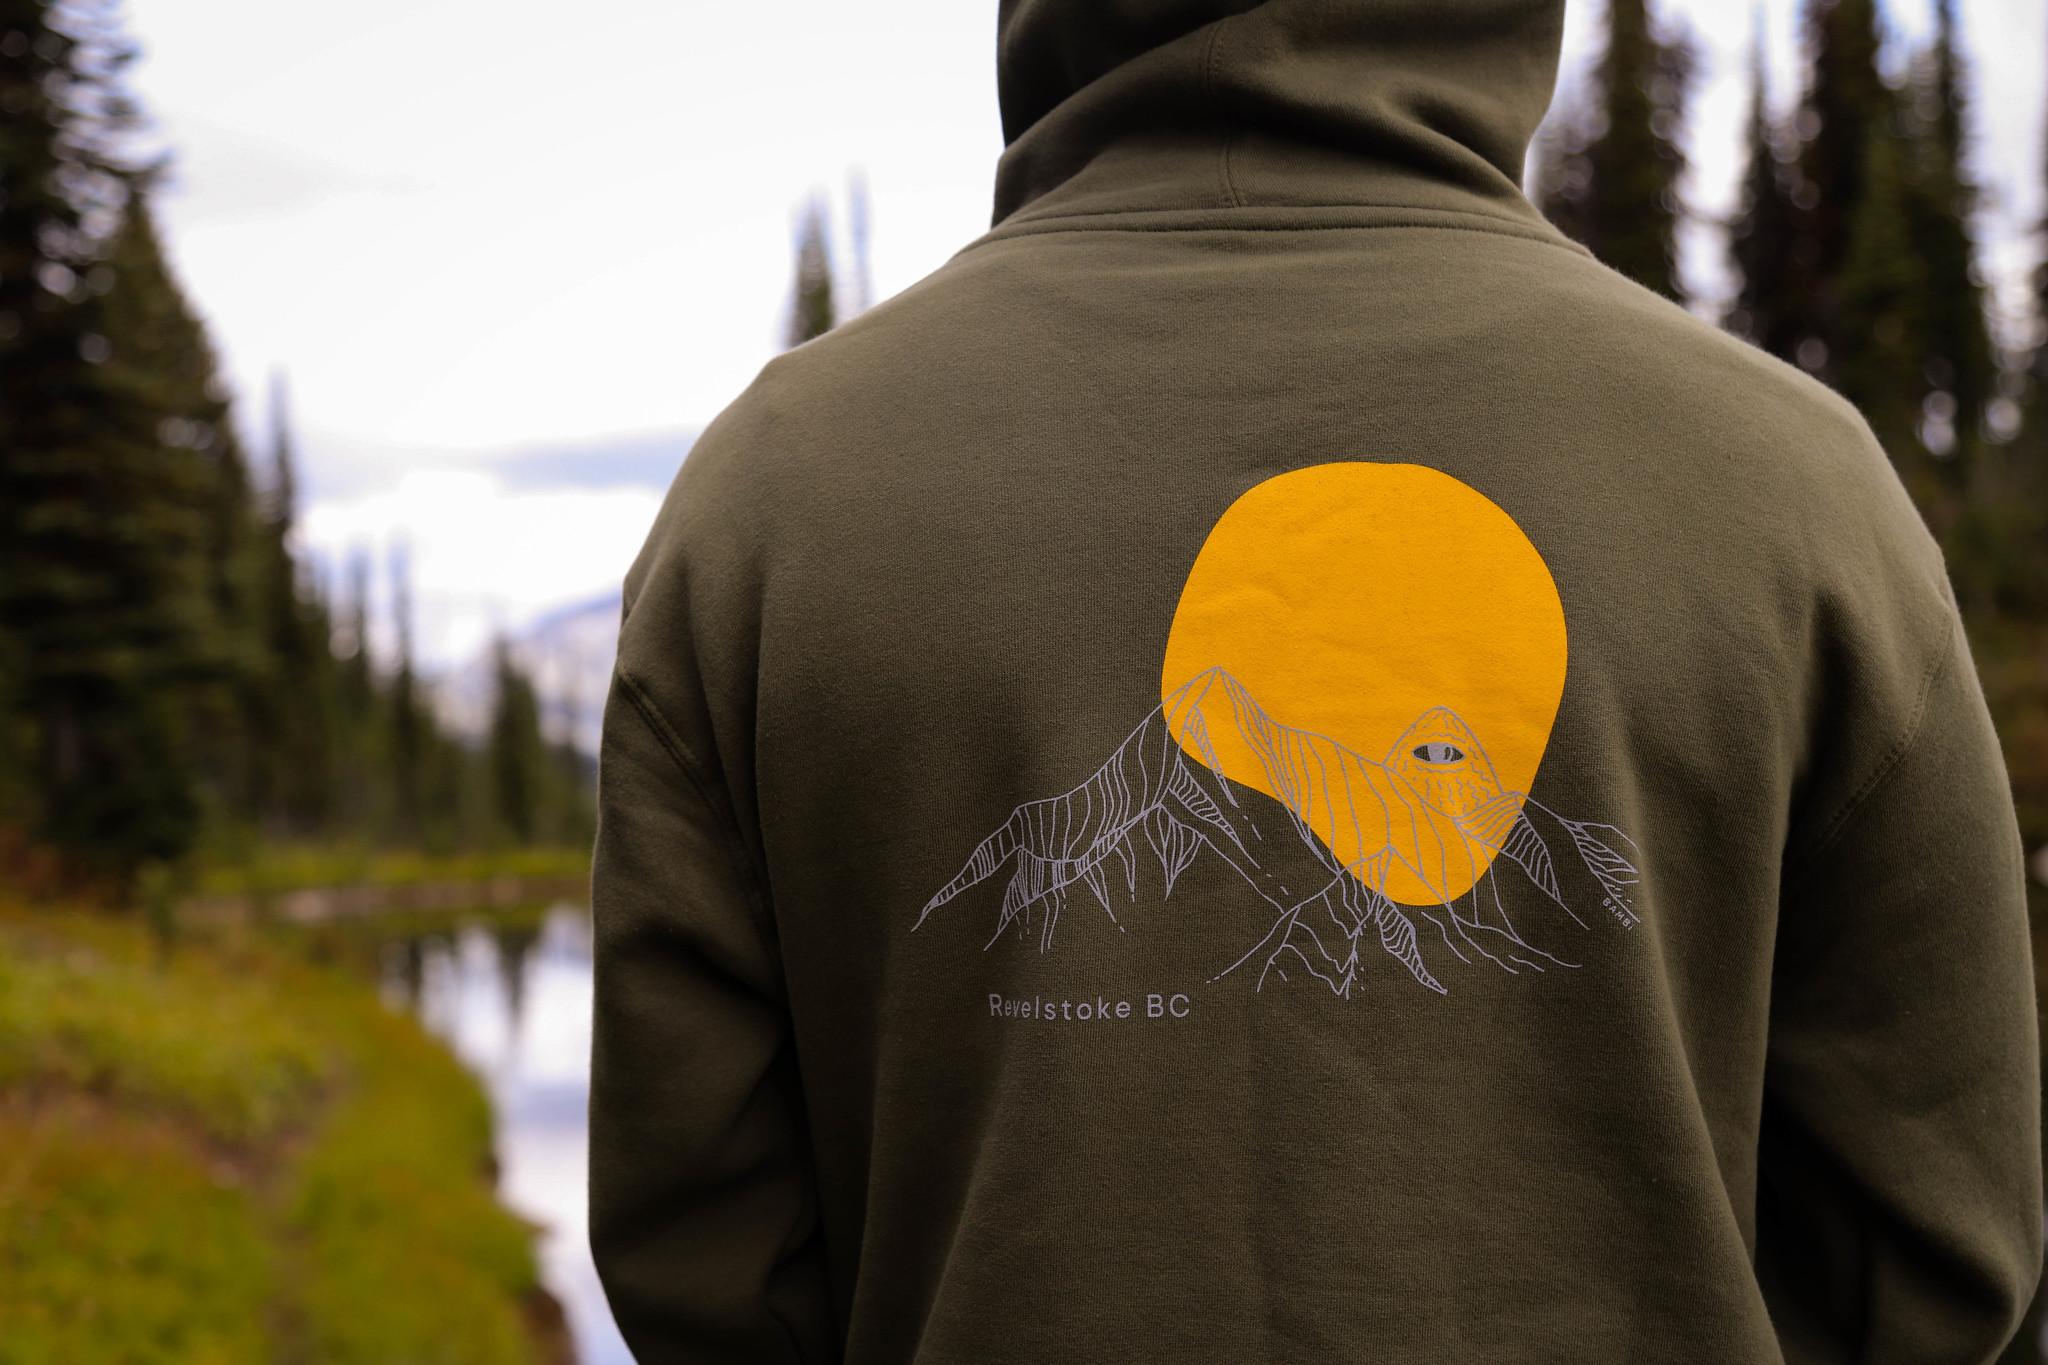 Trading Co. Revelstoke - Calling Hood